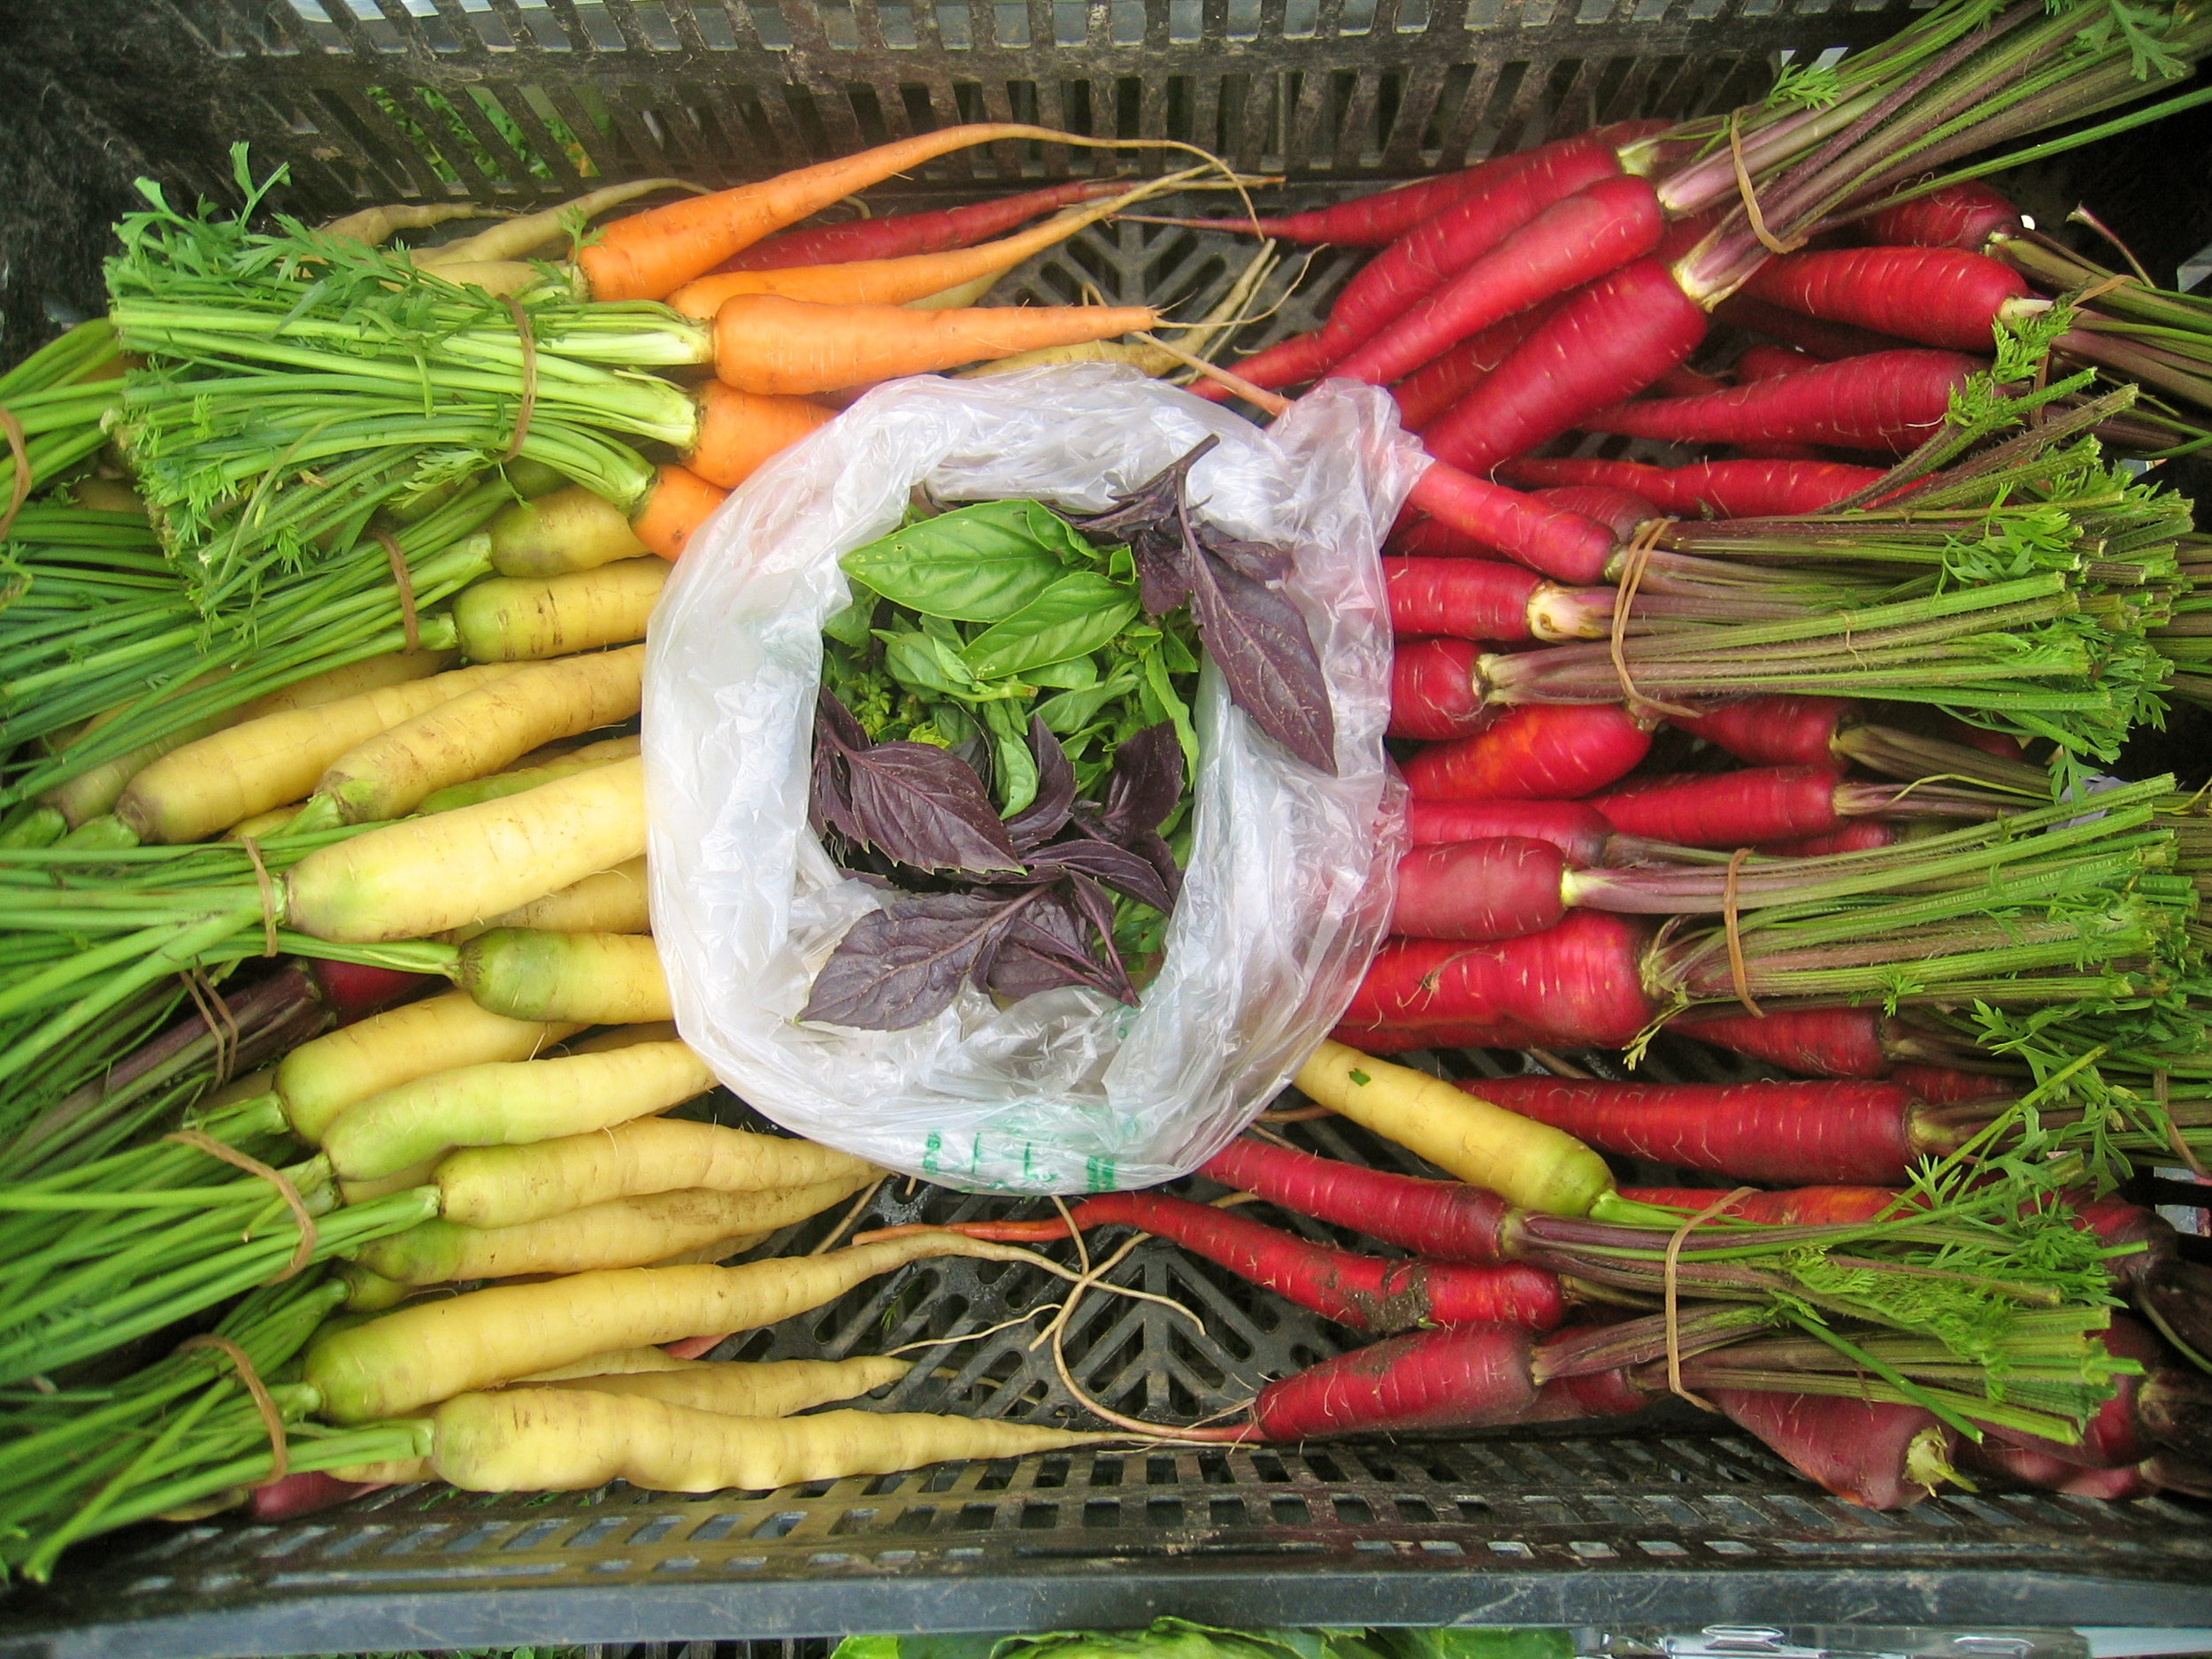 white carrots, cosmic or dragon carrots, basil leaves